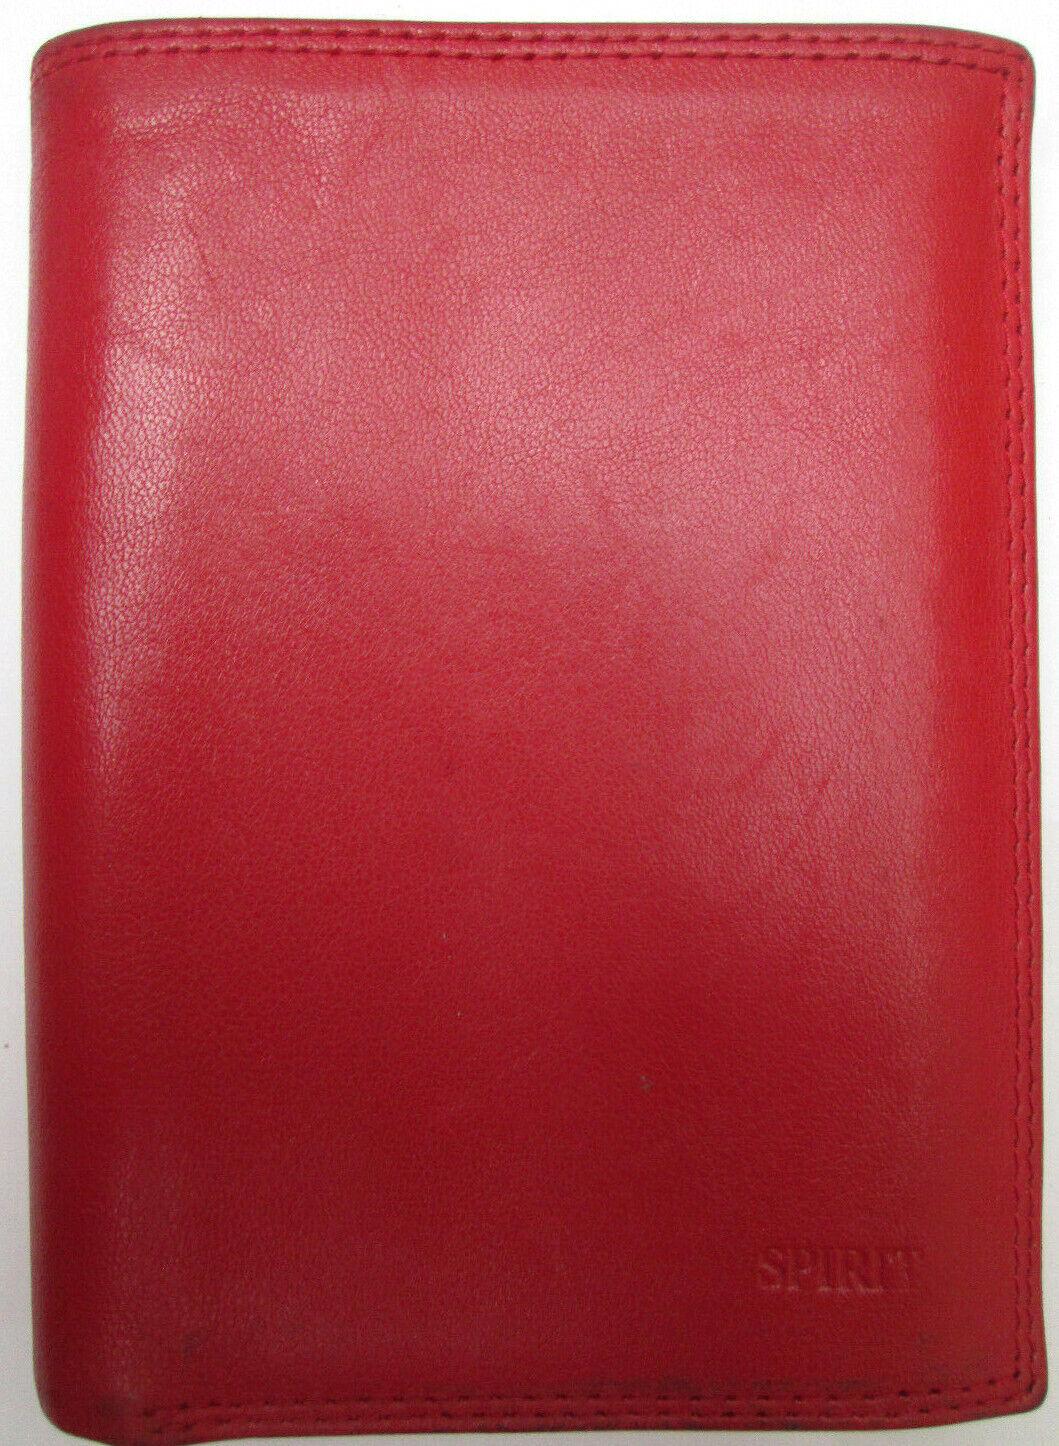 - SPIRIT Portefeuille/porte-monnaie cuir TBEG vintage